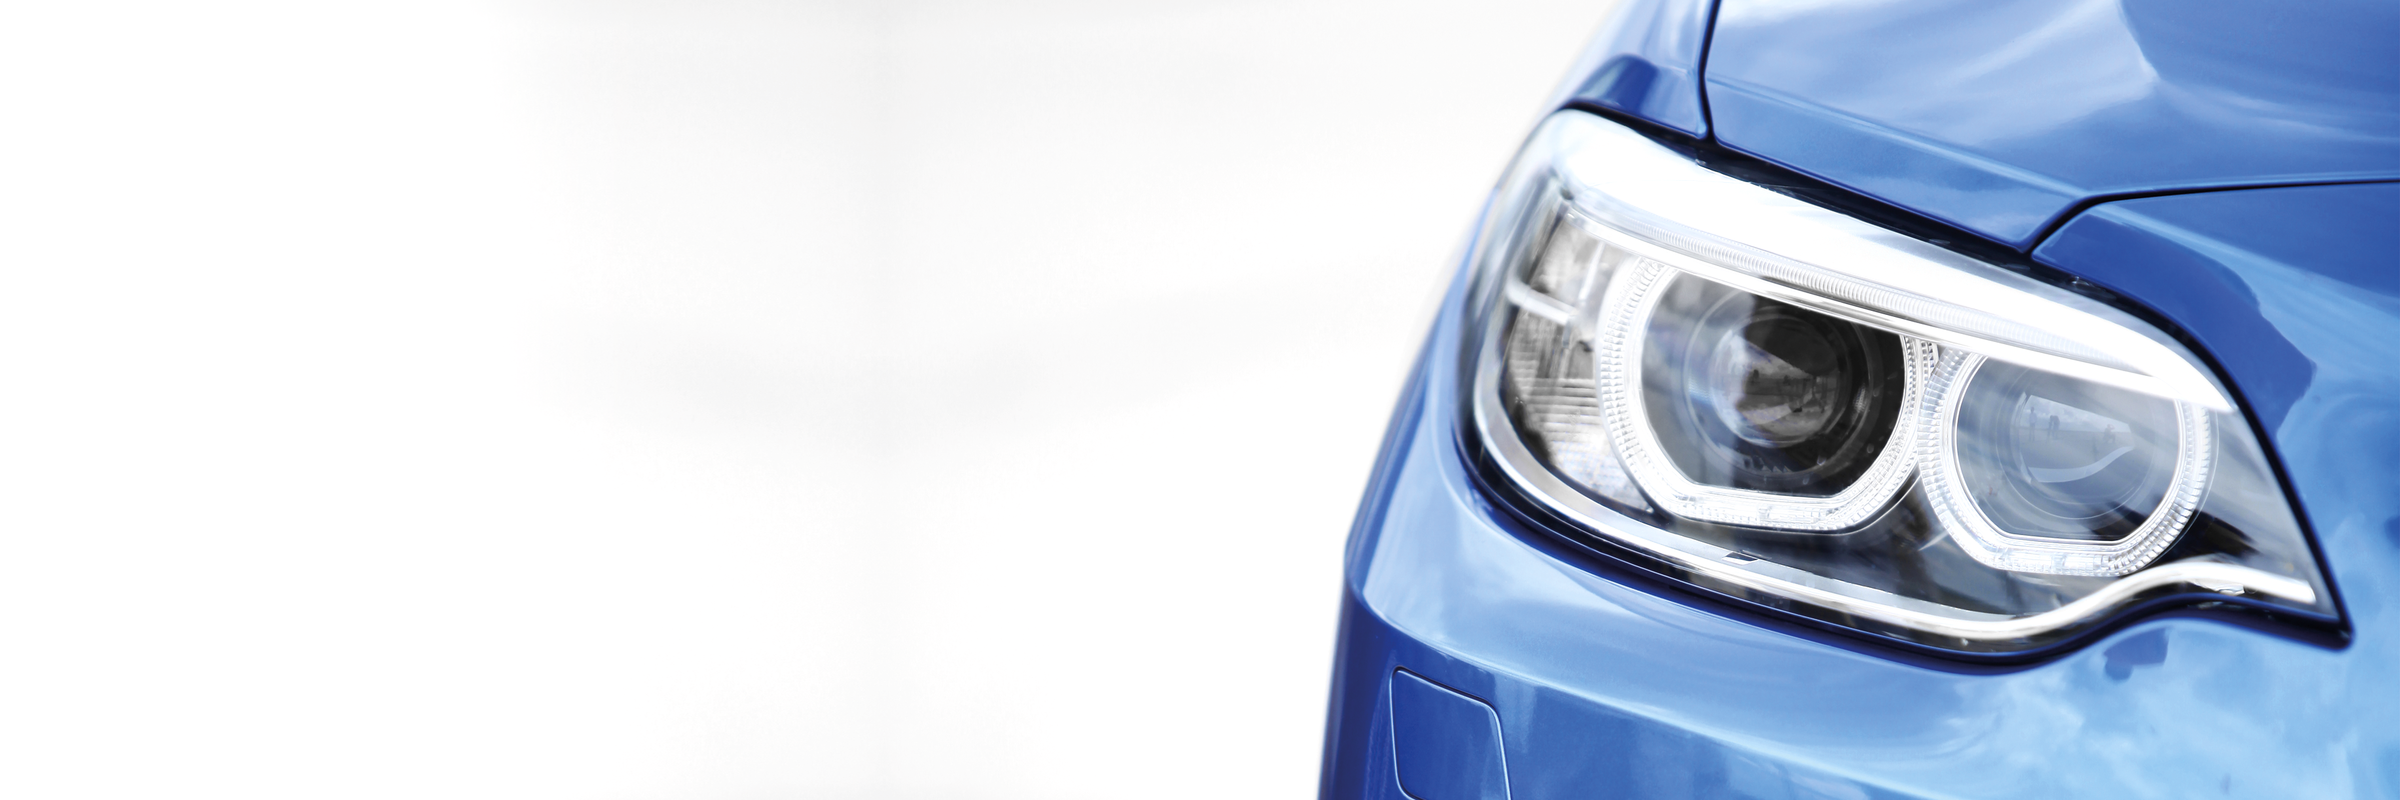 Motoryzacja - LED Lighting